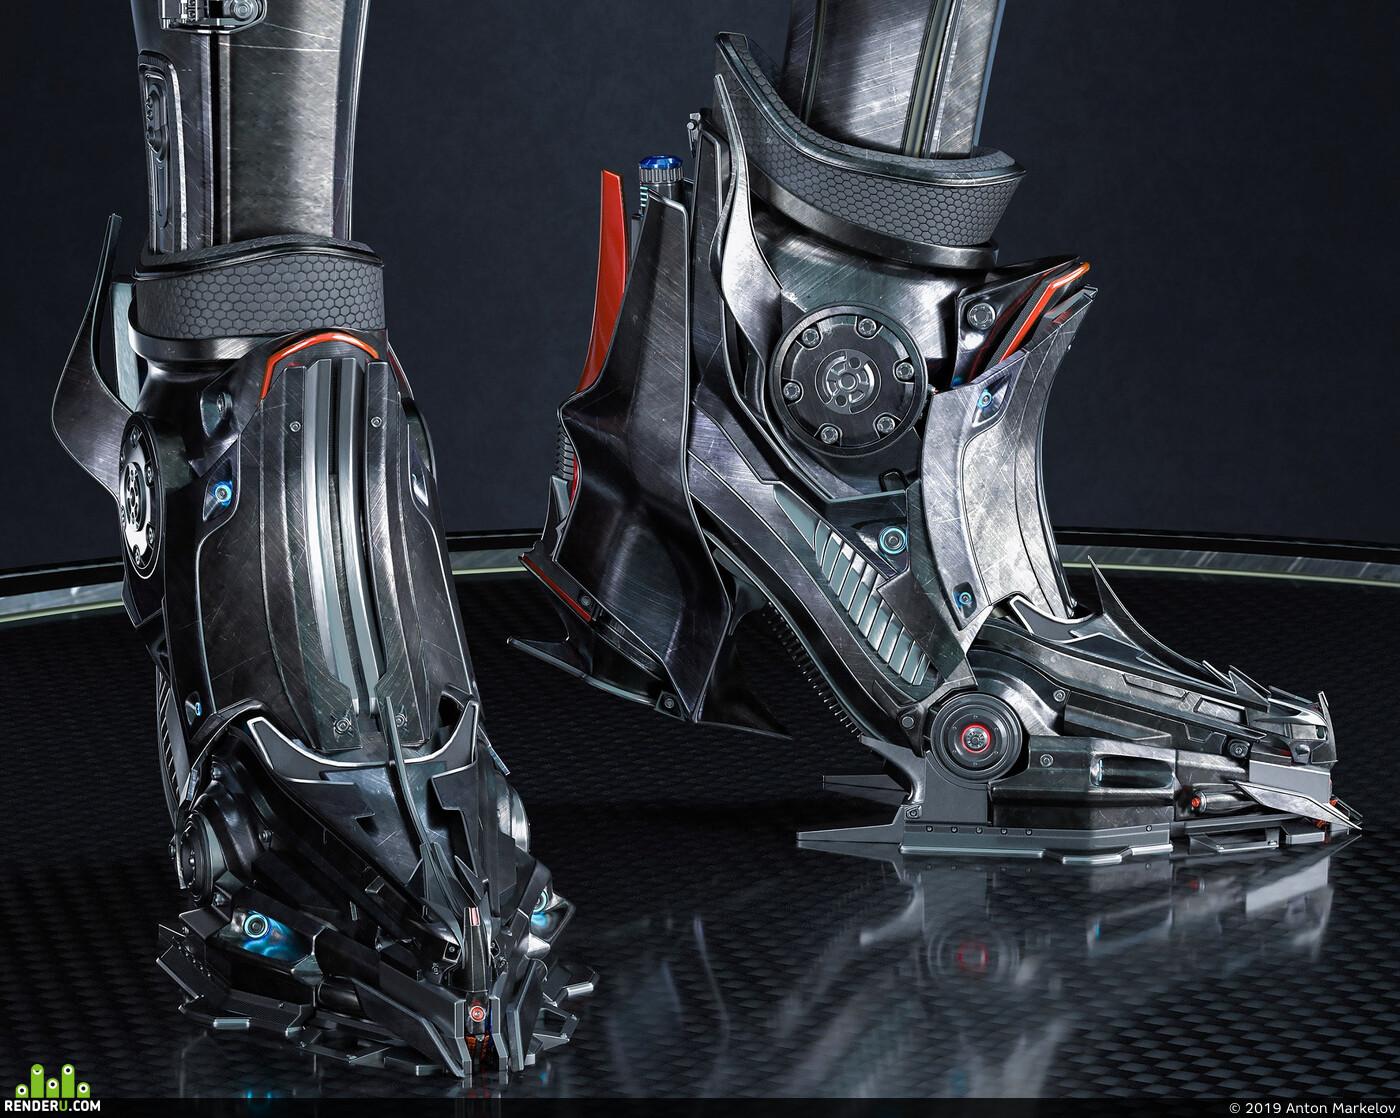 sci fi armor, Science fiction, power armor, Sci-Fi Cyborg Girl, Robots